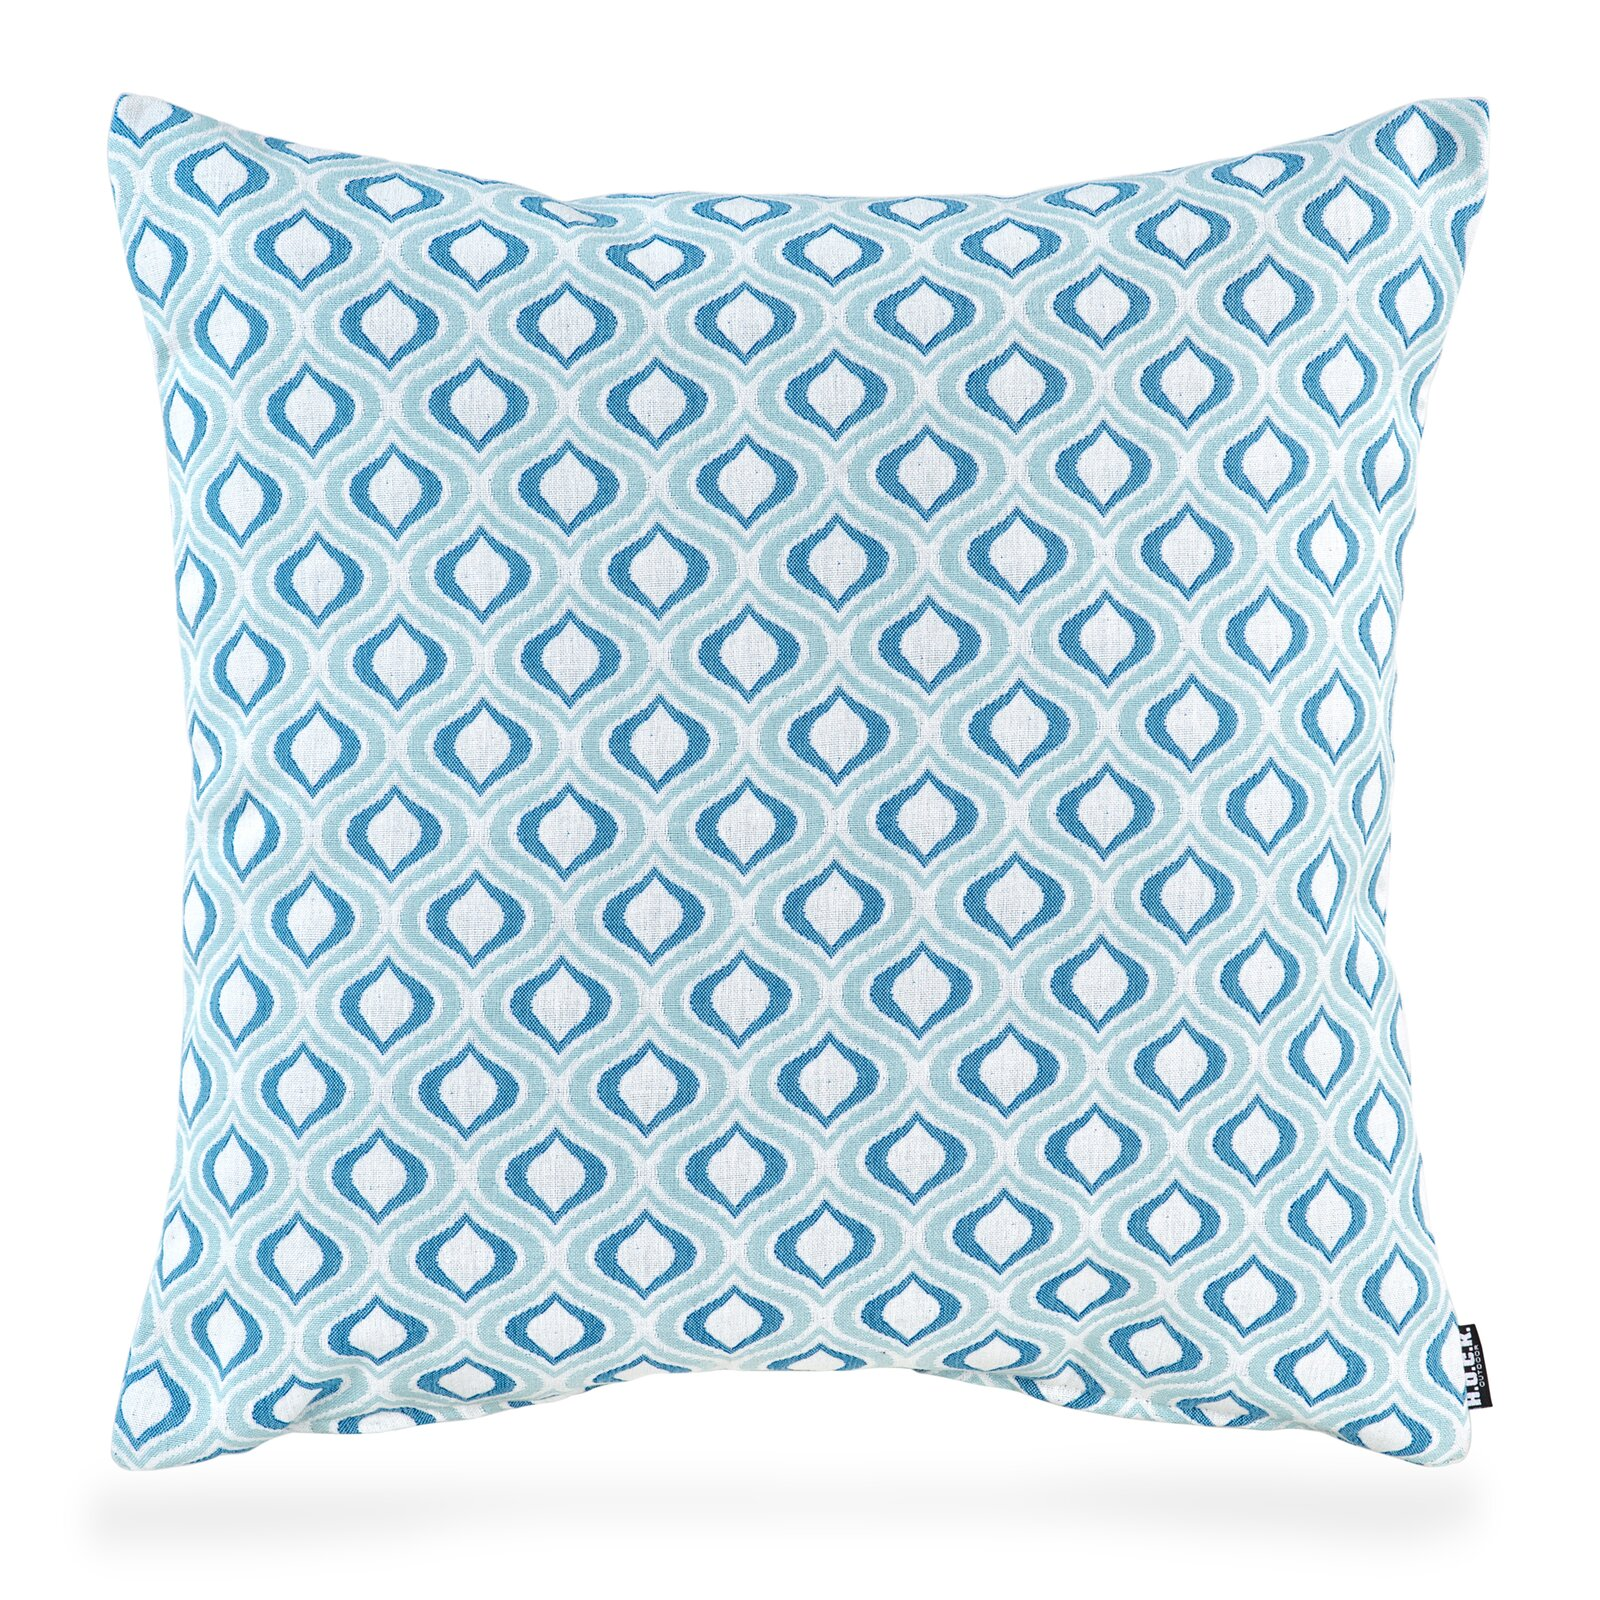 h o c k gary outdoor kissen 50x50cm blue 66 cobo 22 90. Black Bedroom Furniture Sets. Home Design Ideas